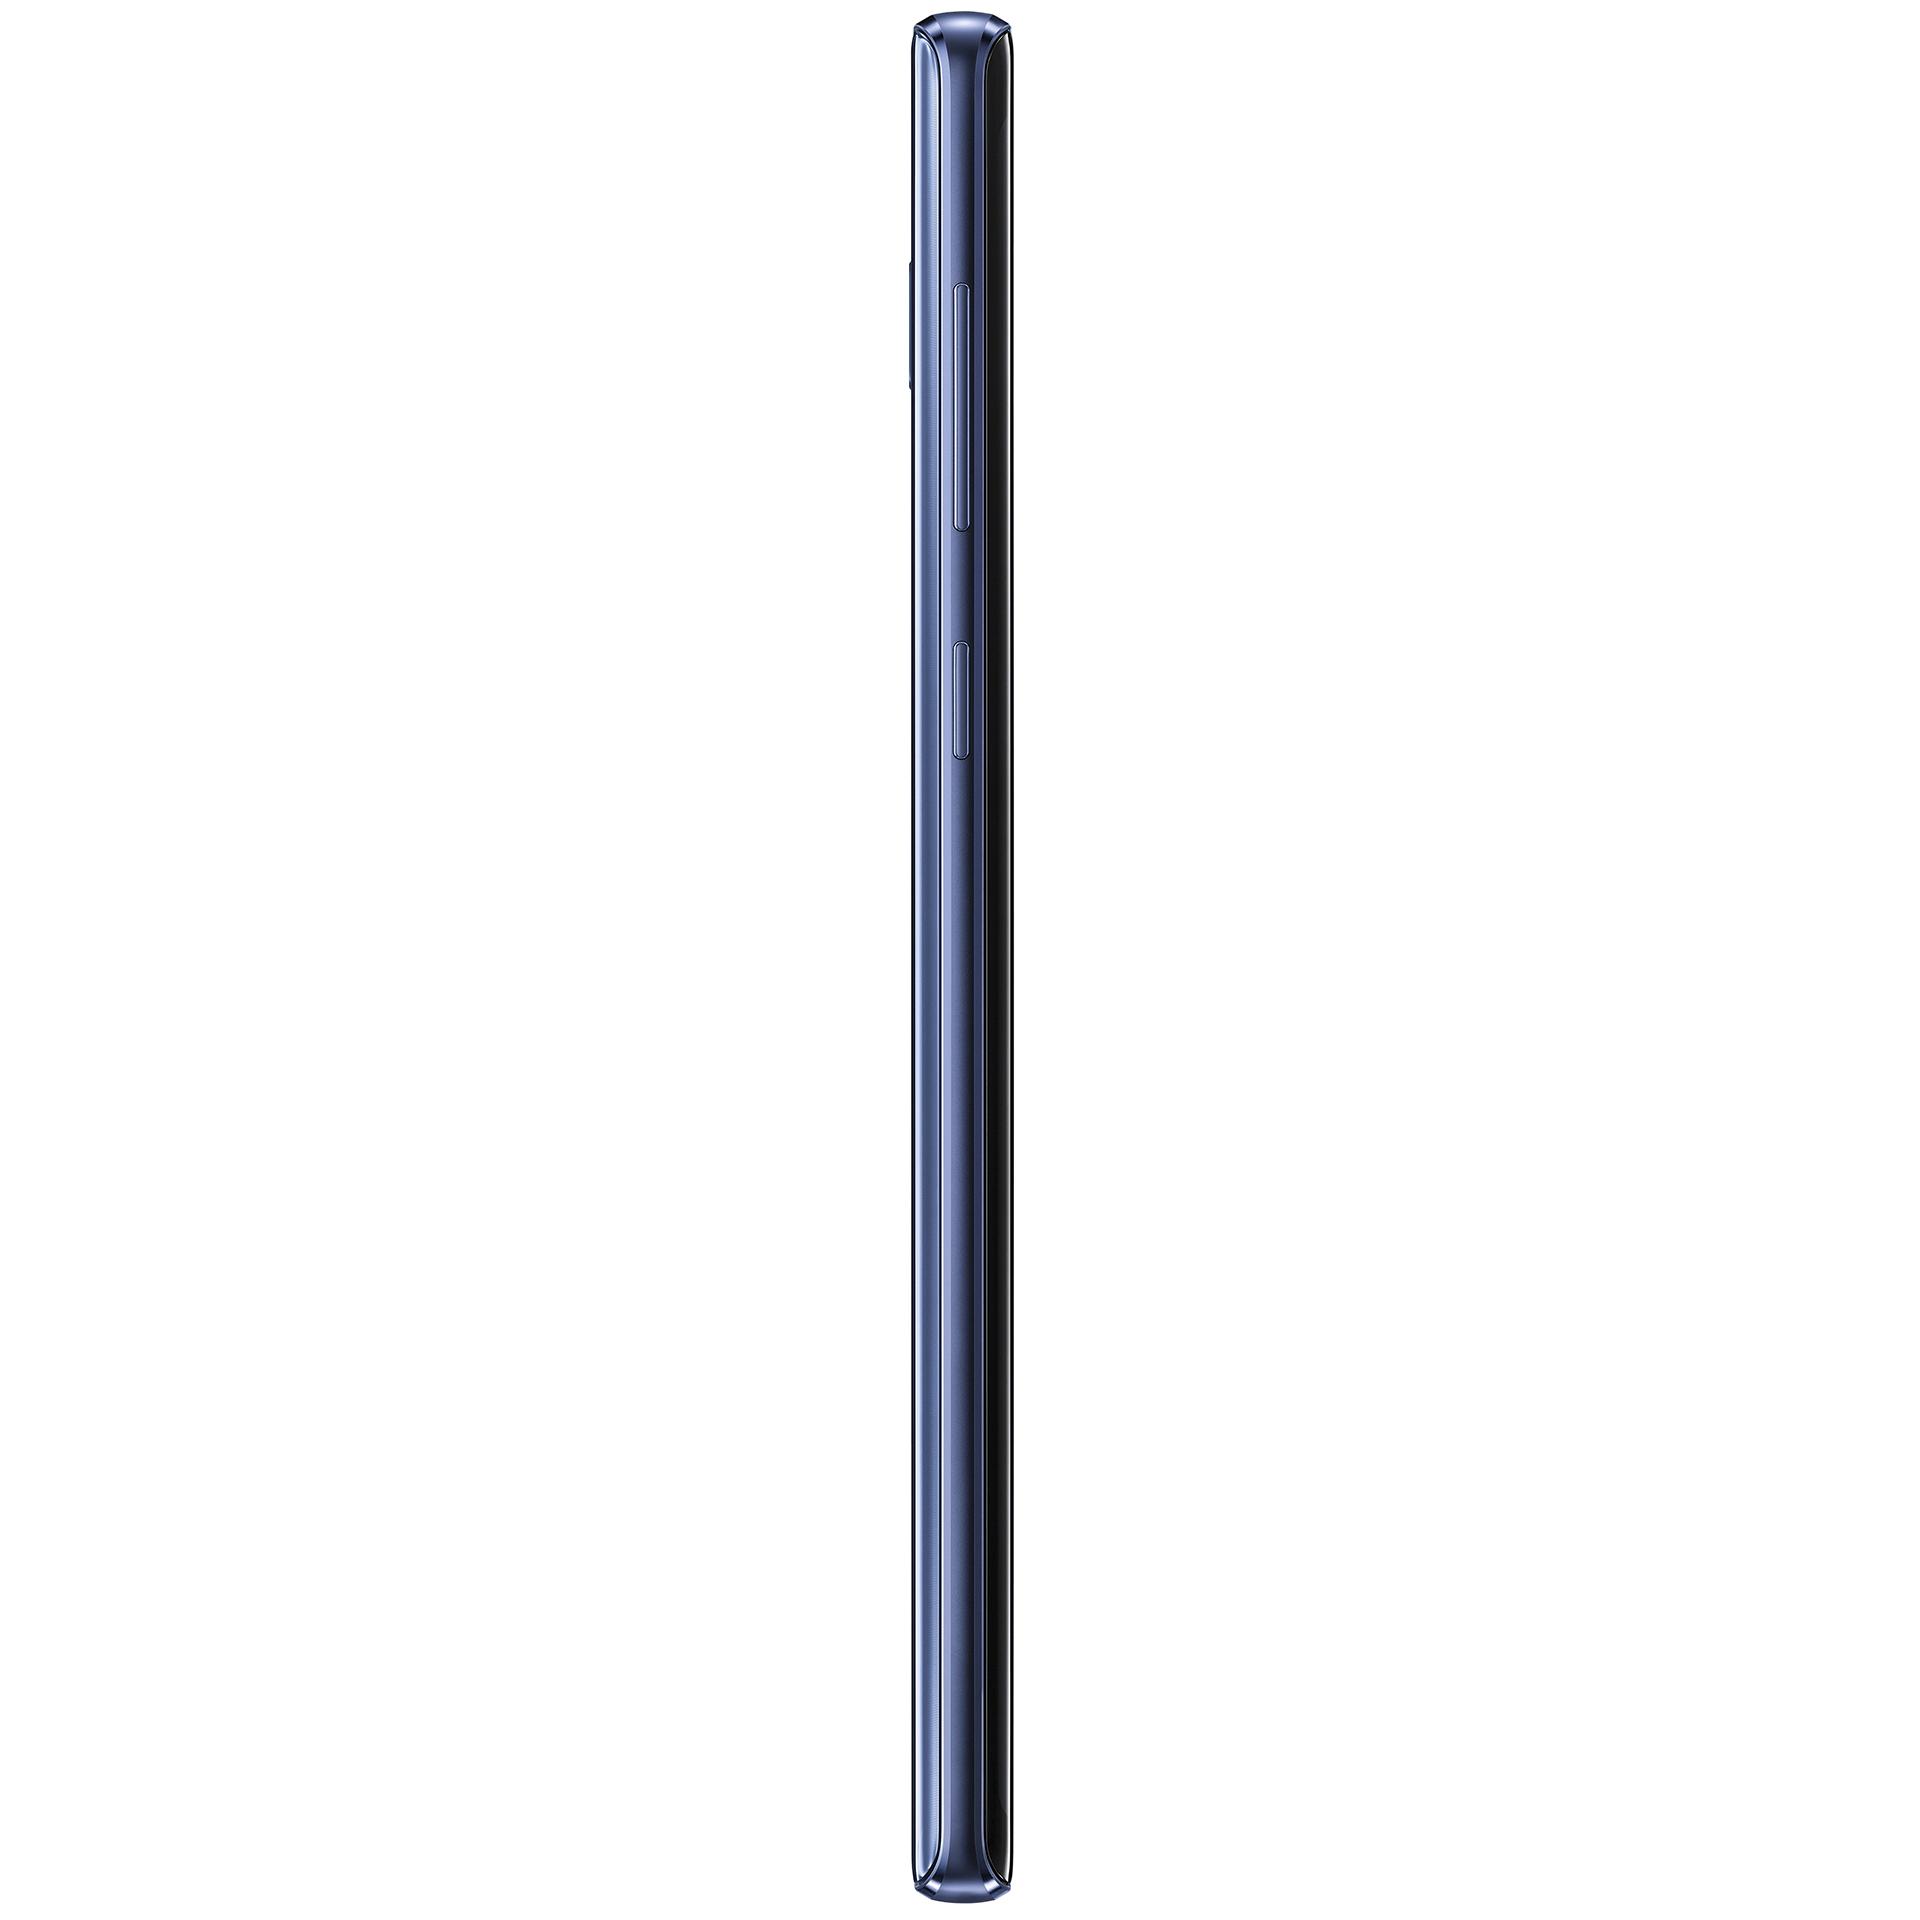 mobiiltelefon Samsung Galaxy Note 9  (sinine)